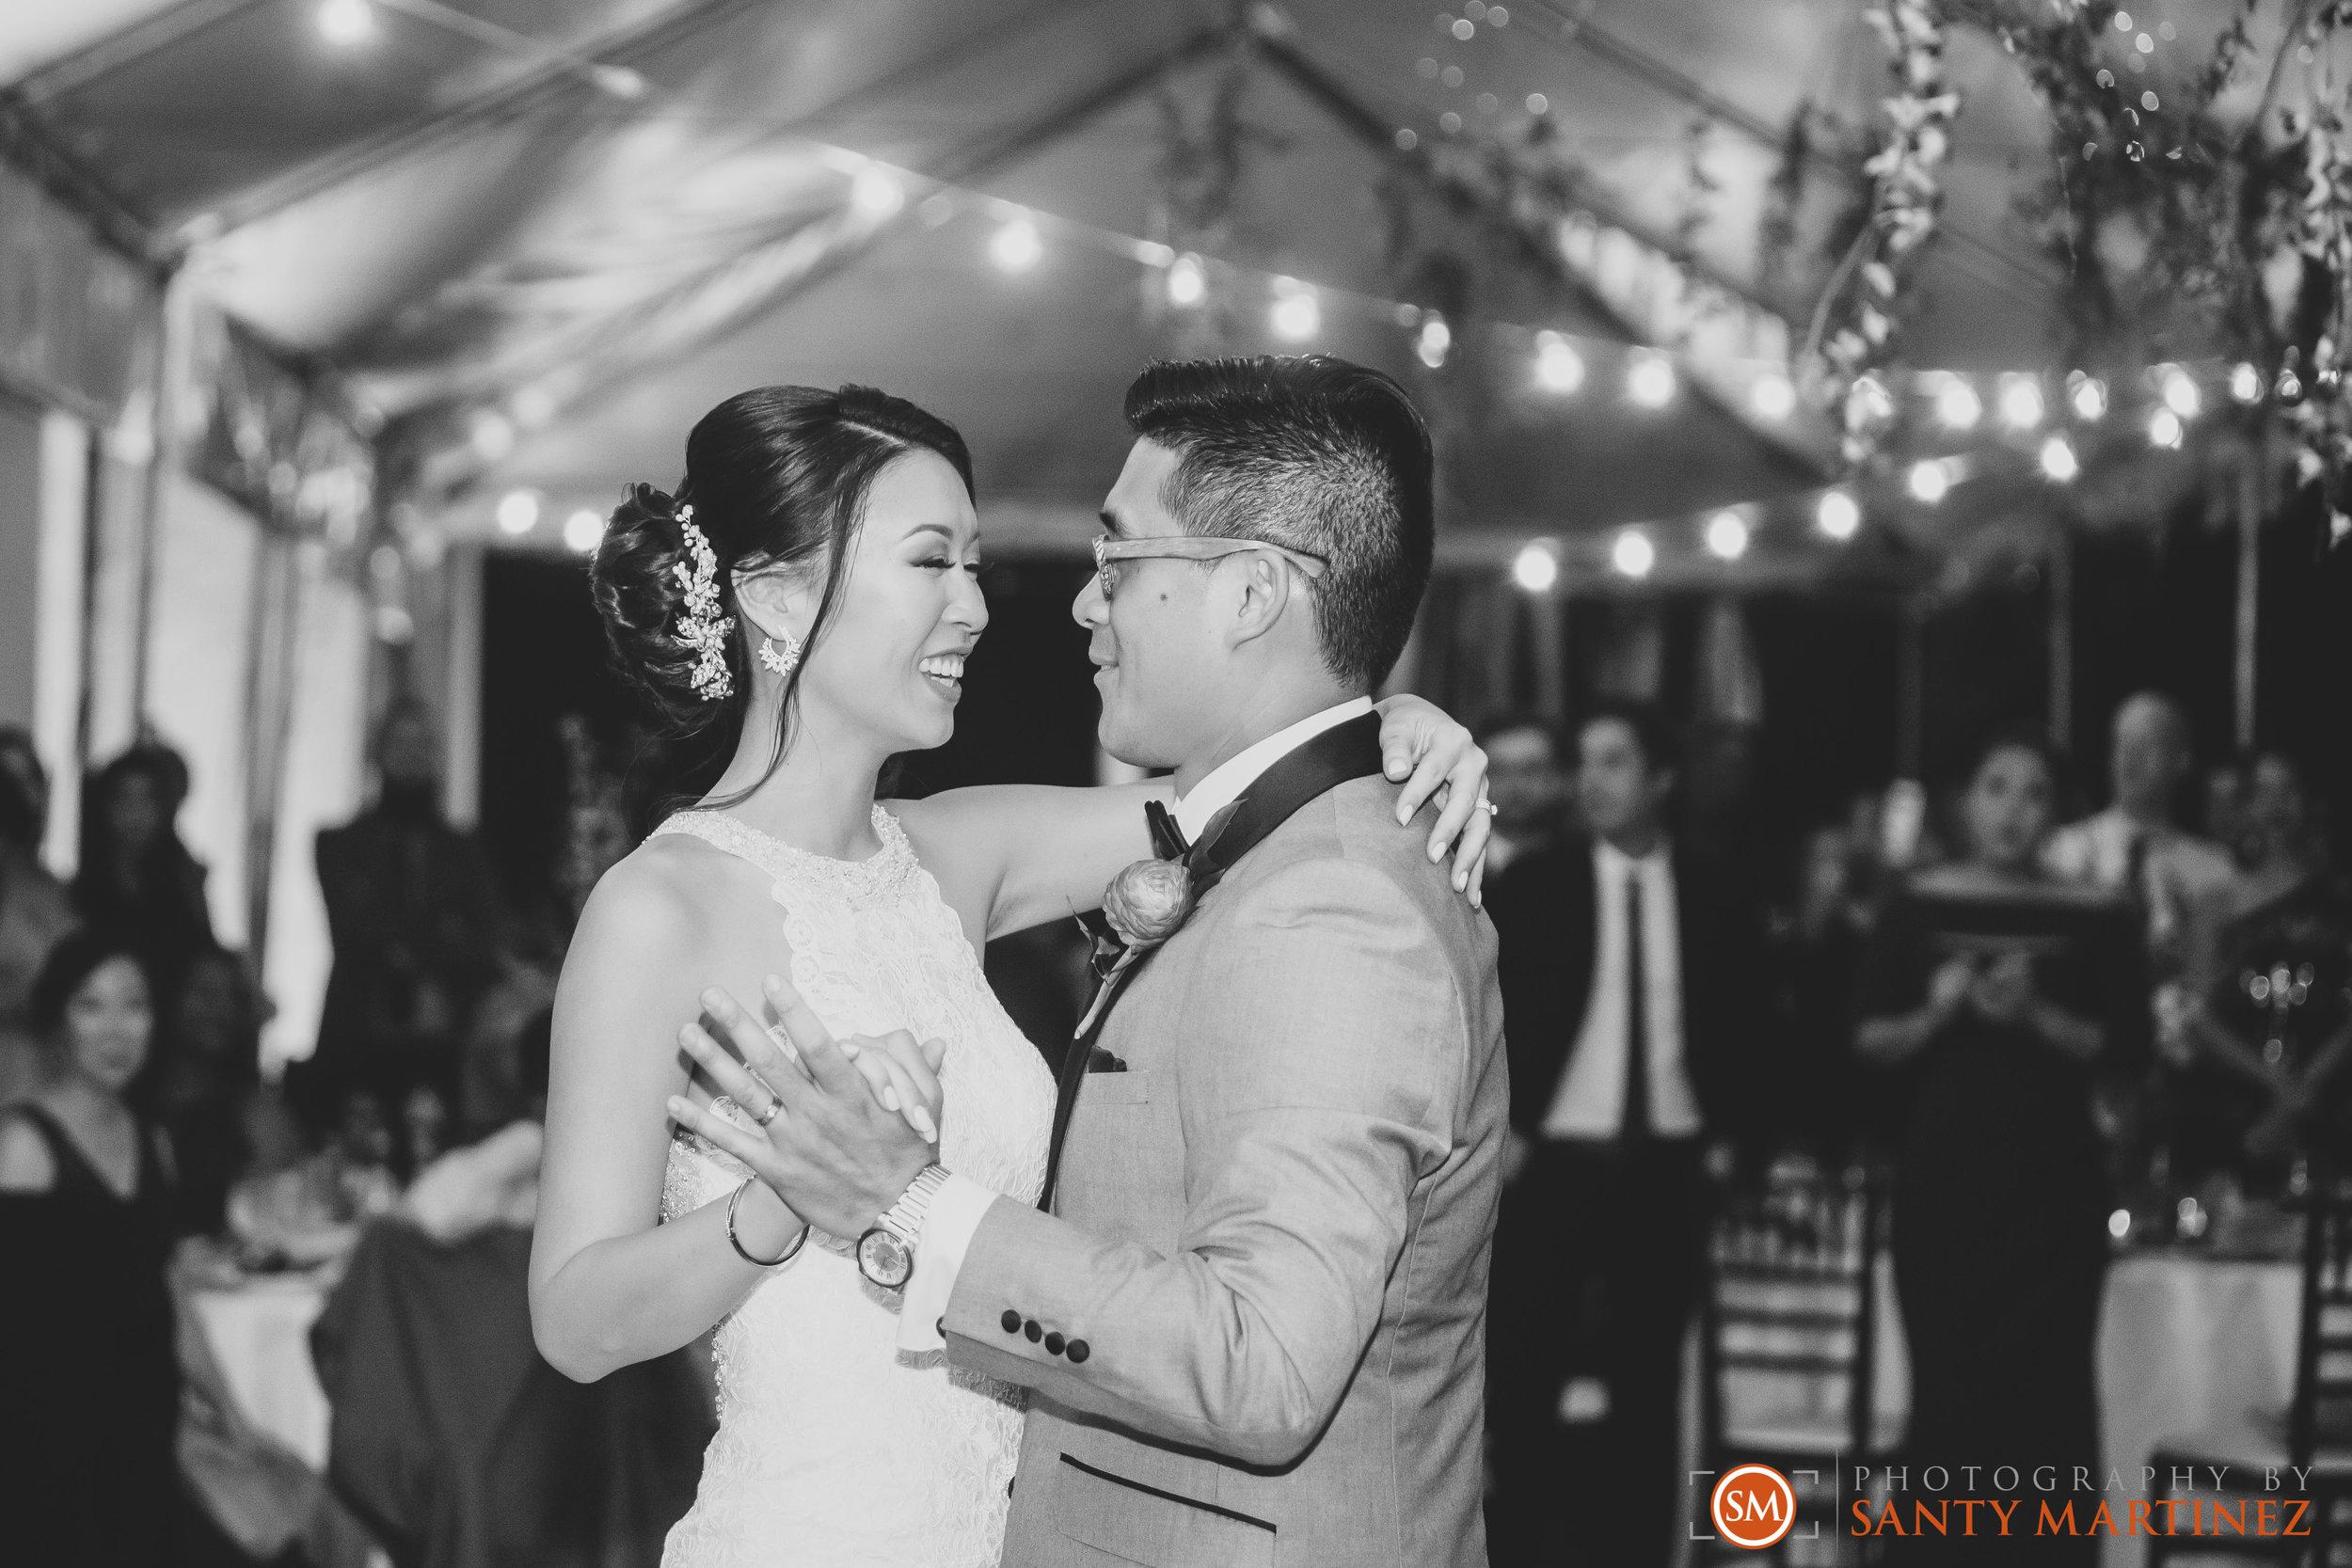 Wedding Bonnet House - Photography by Santy Martinez-41.jpg